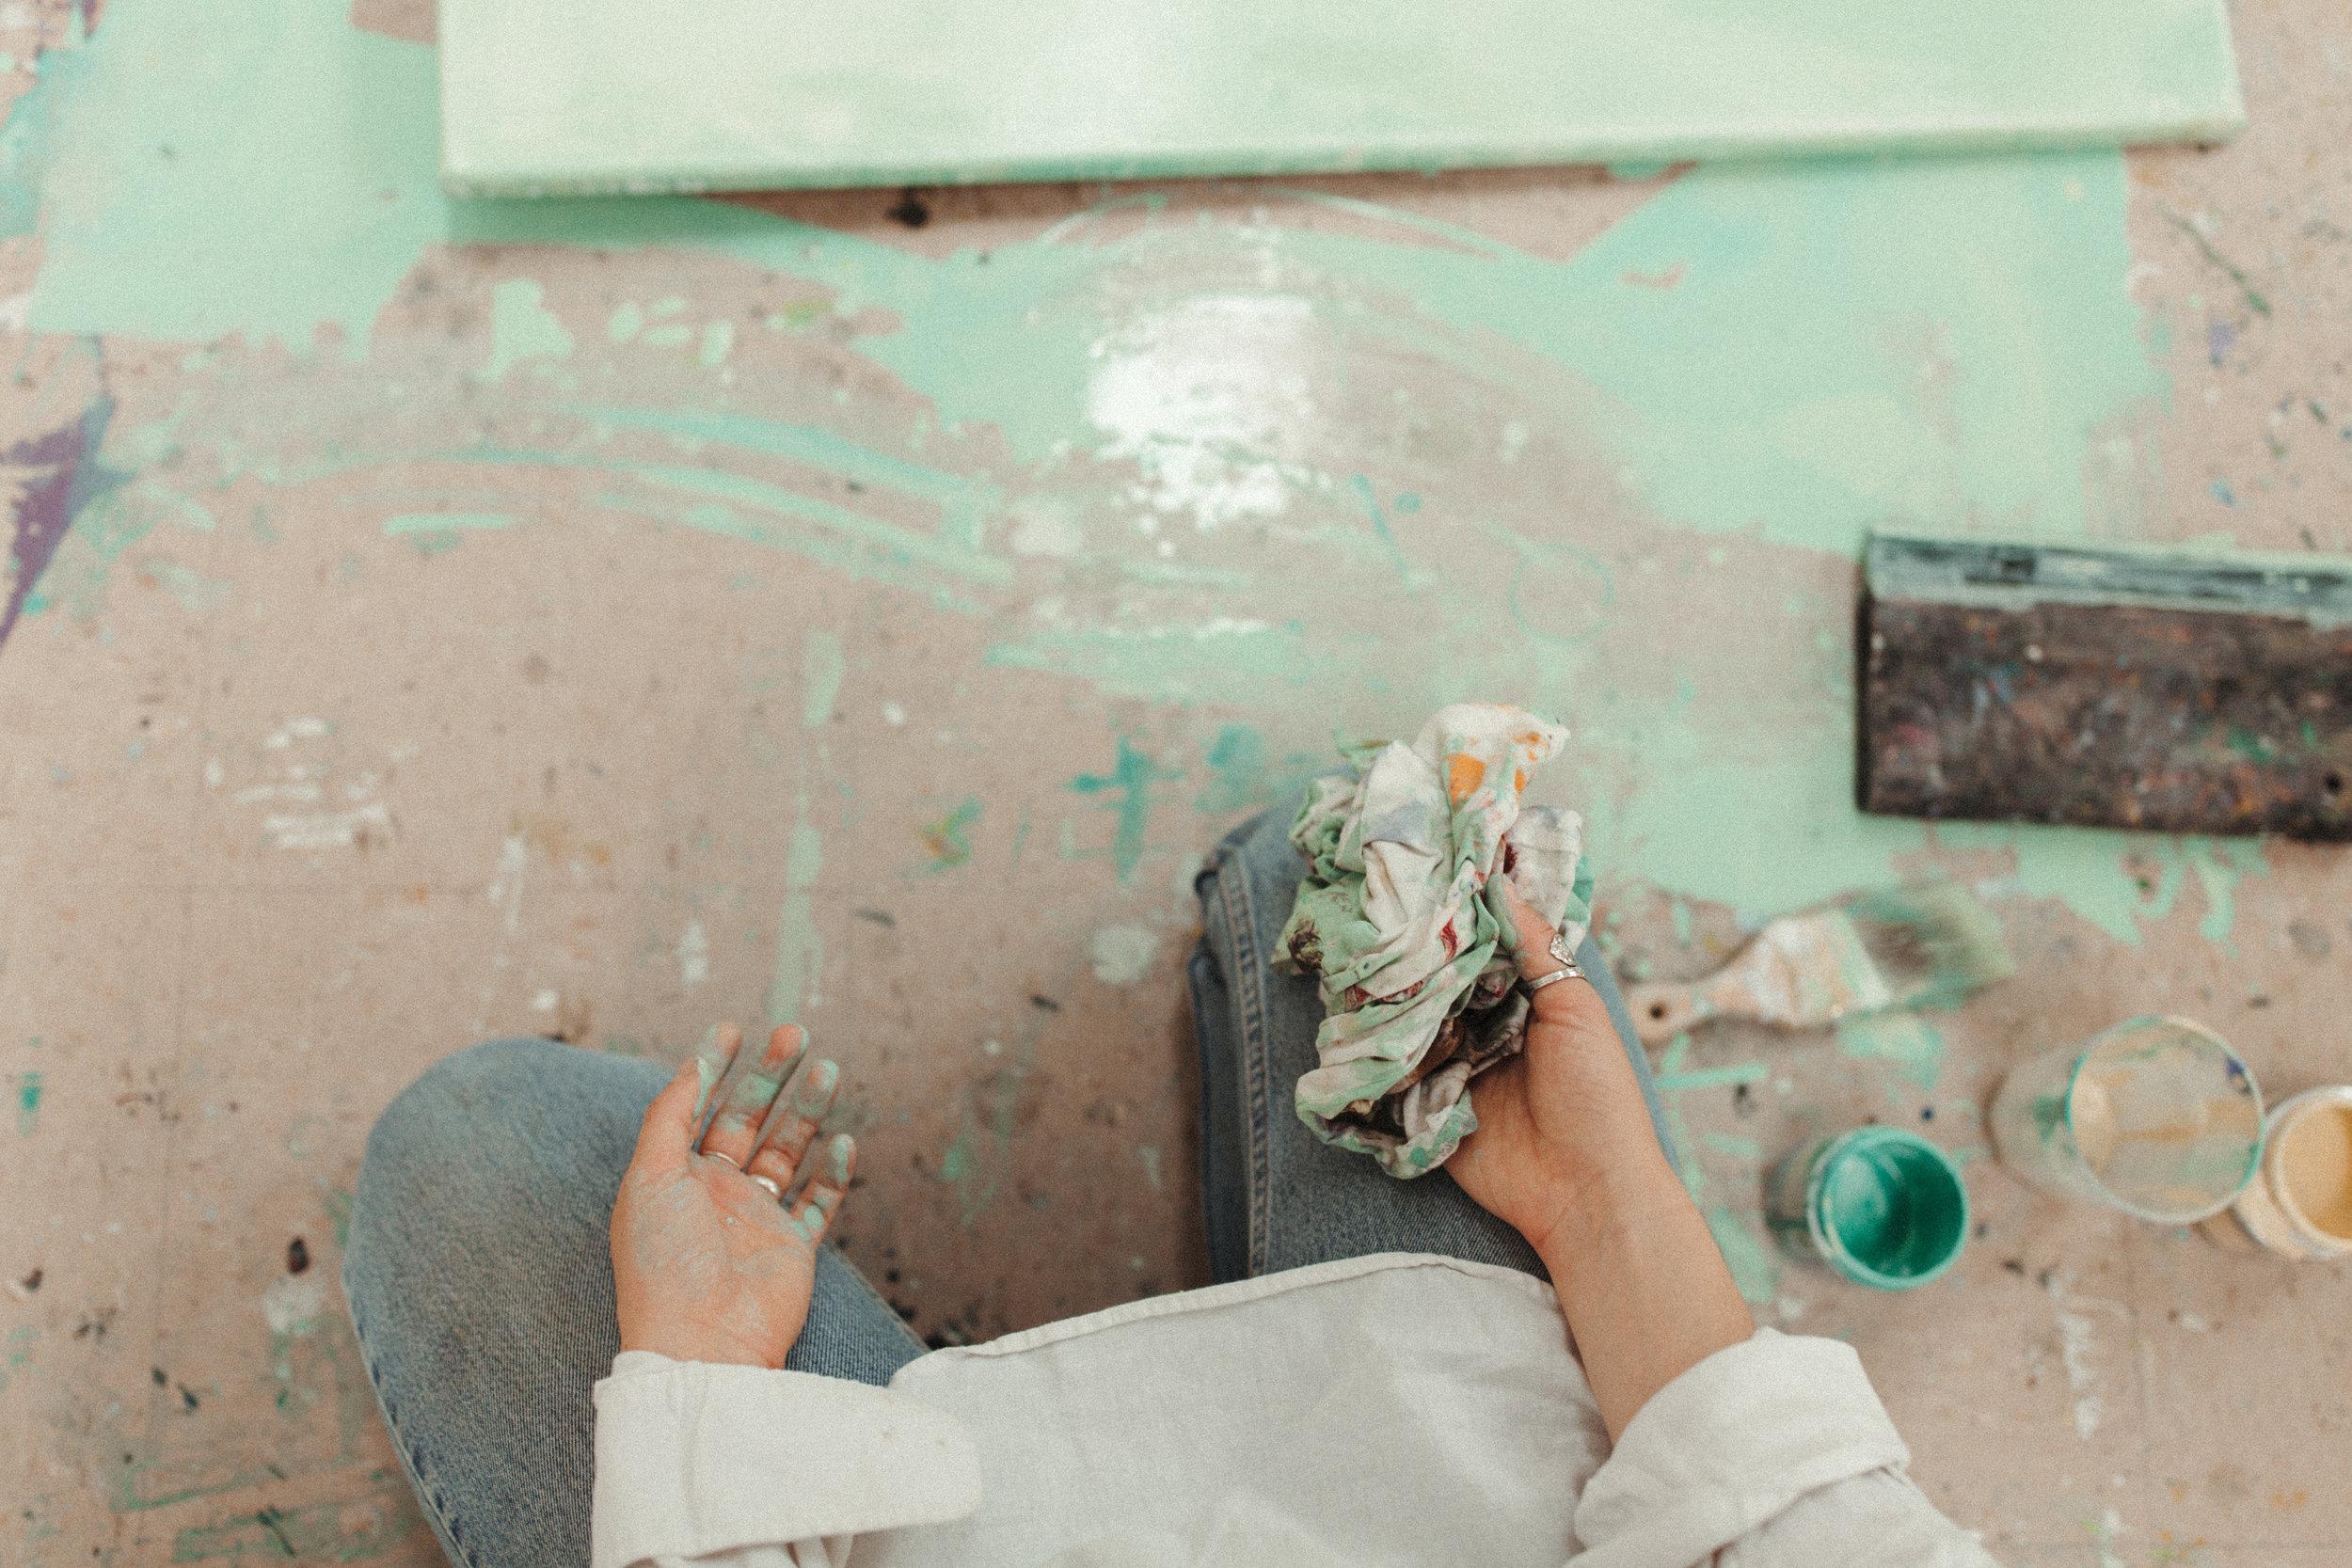 emily-pawlica-art-process-2019-peytoncurry-0614.jpg